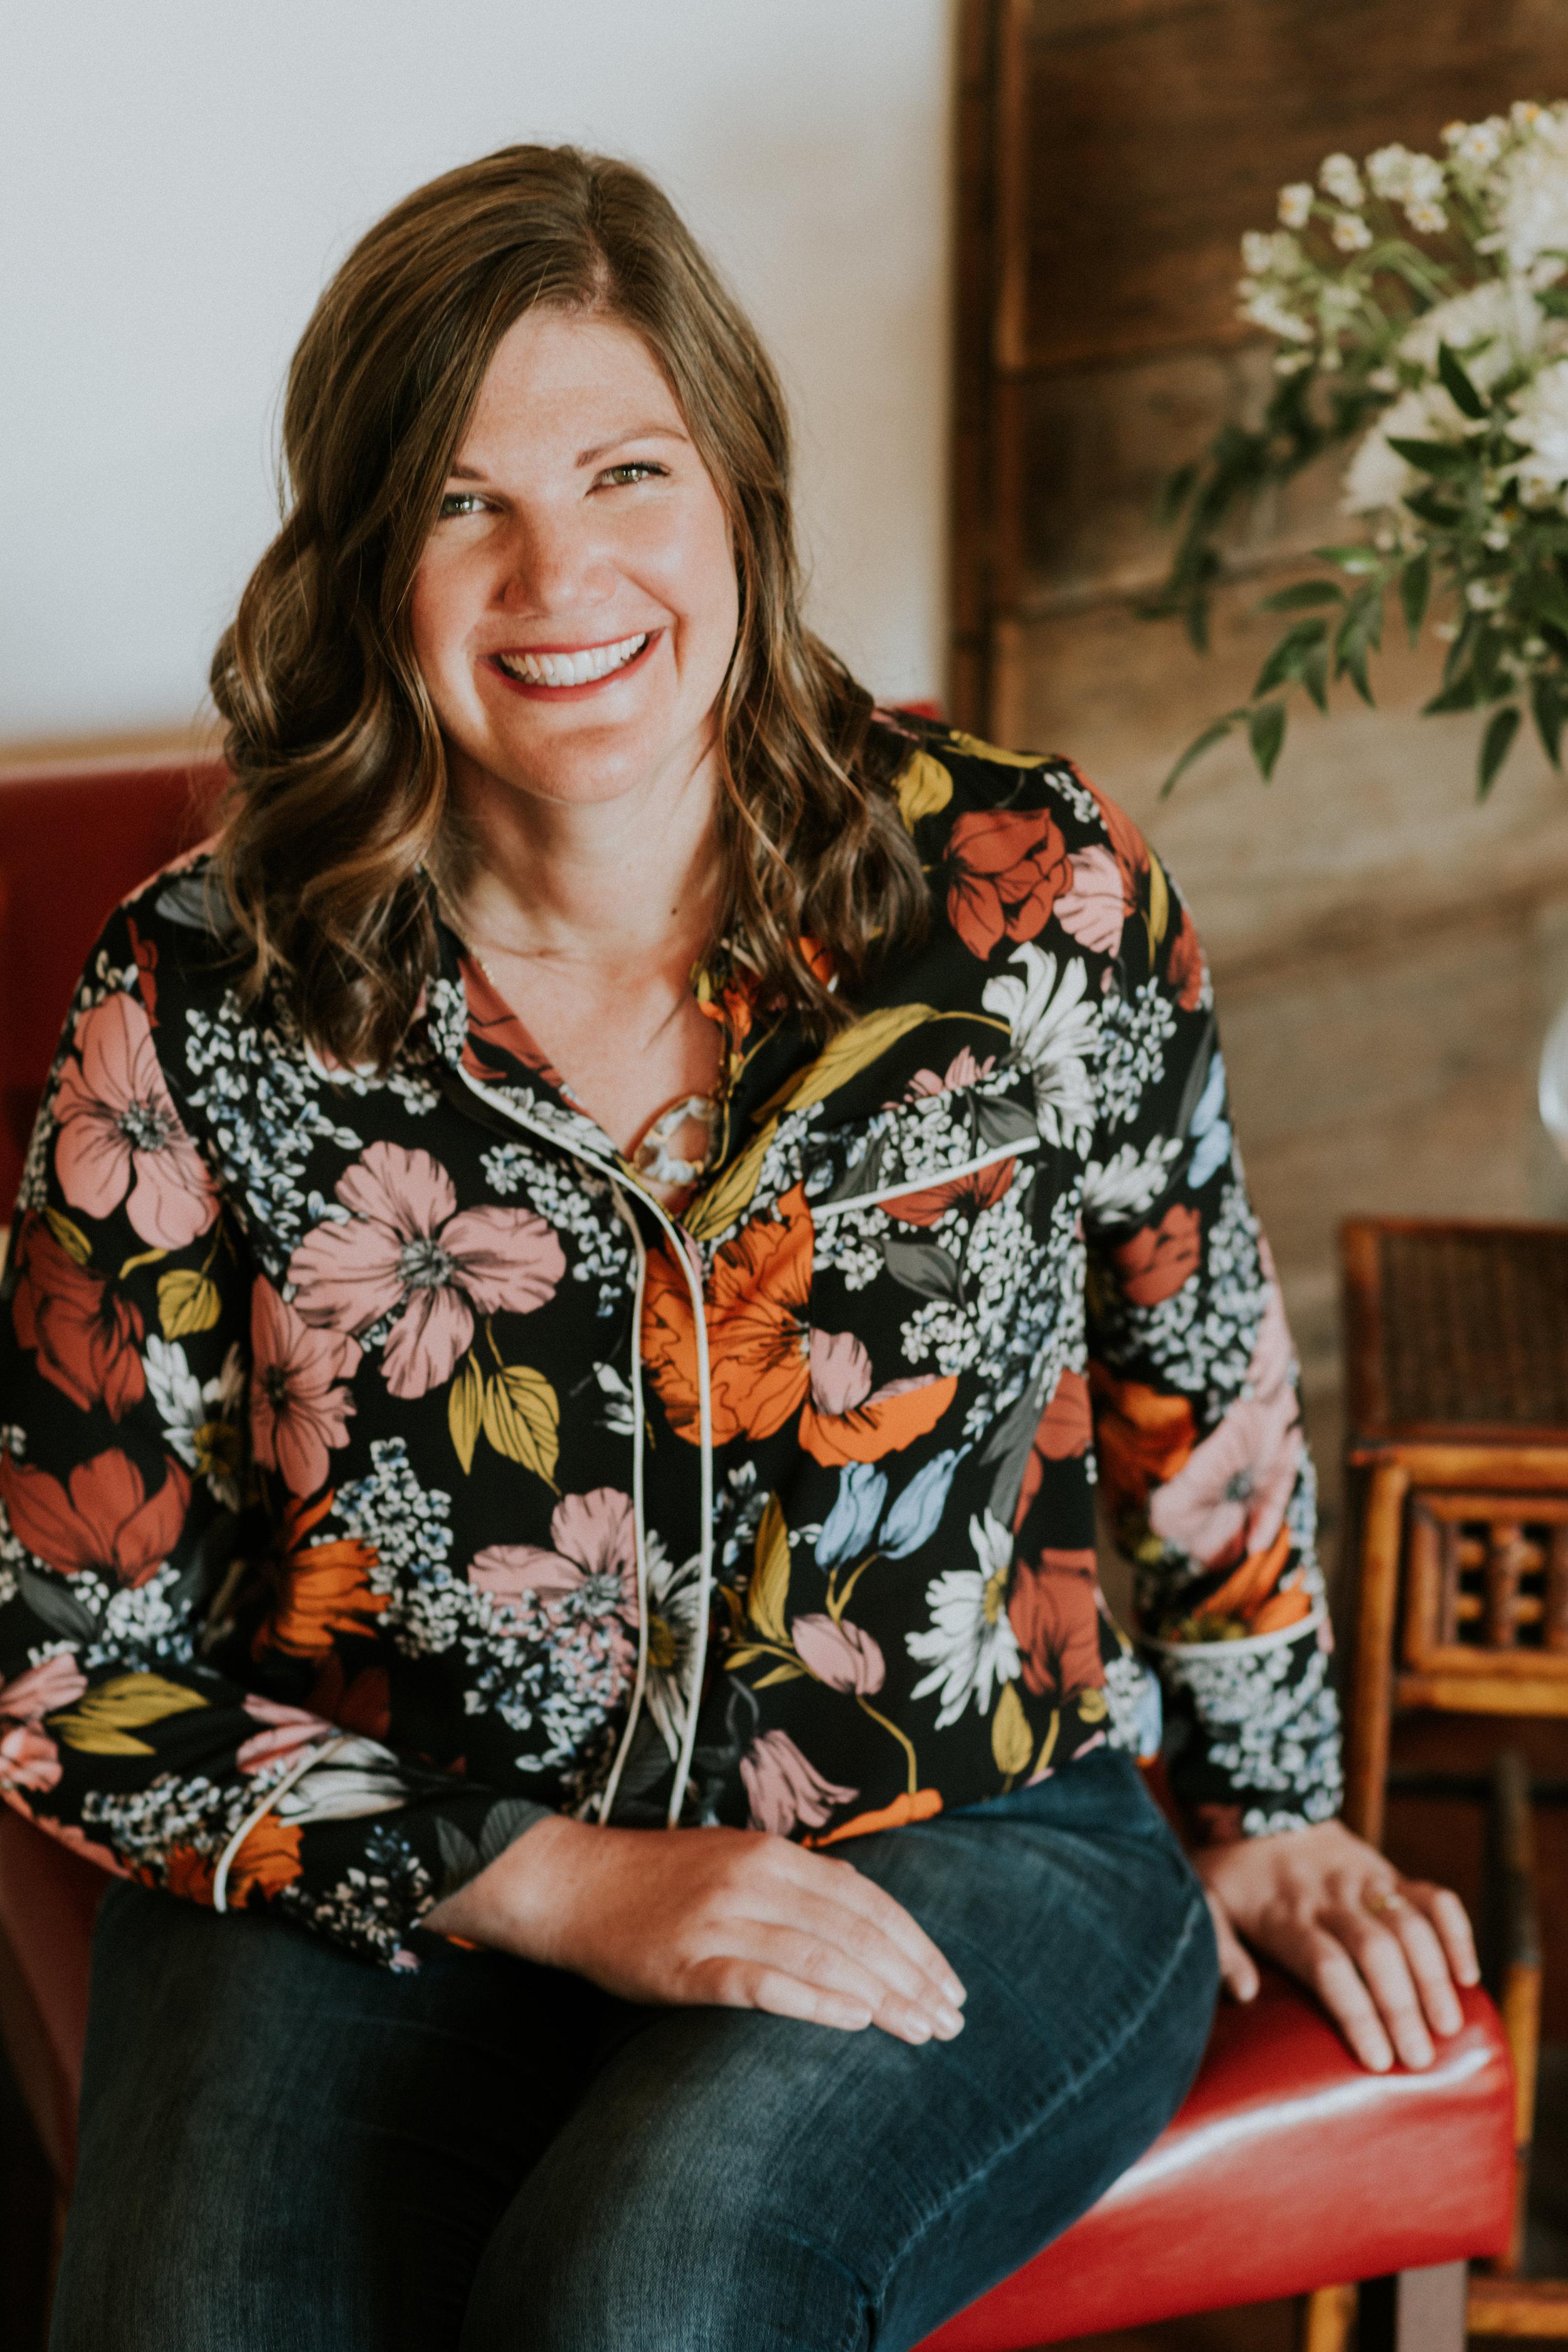 Garden Society founder, Erin Gore